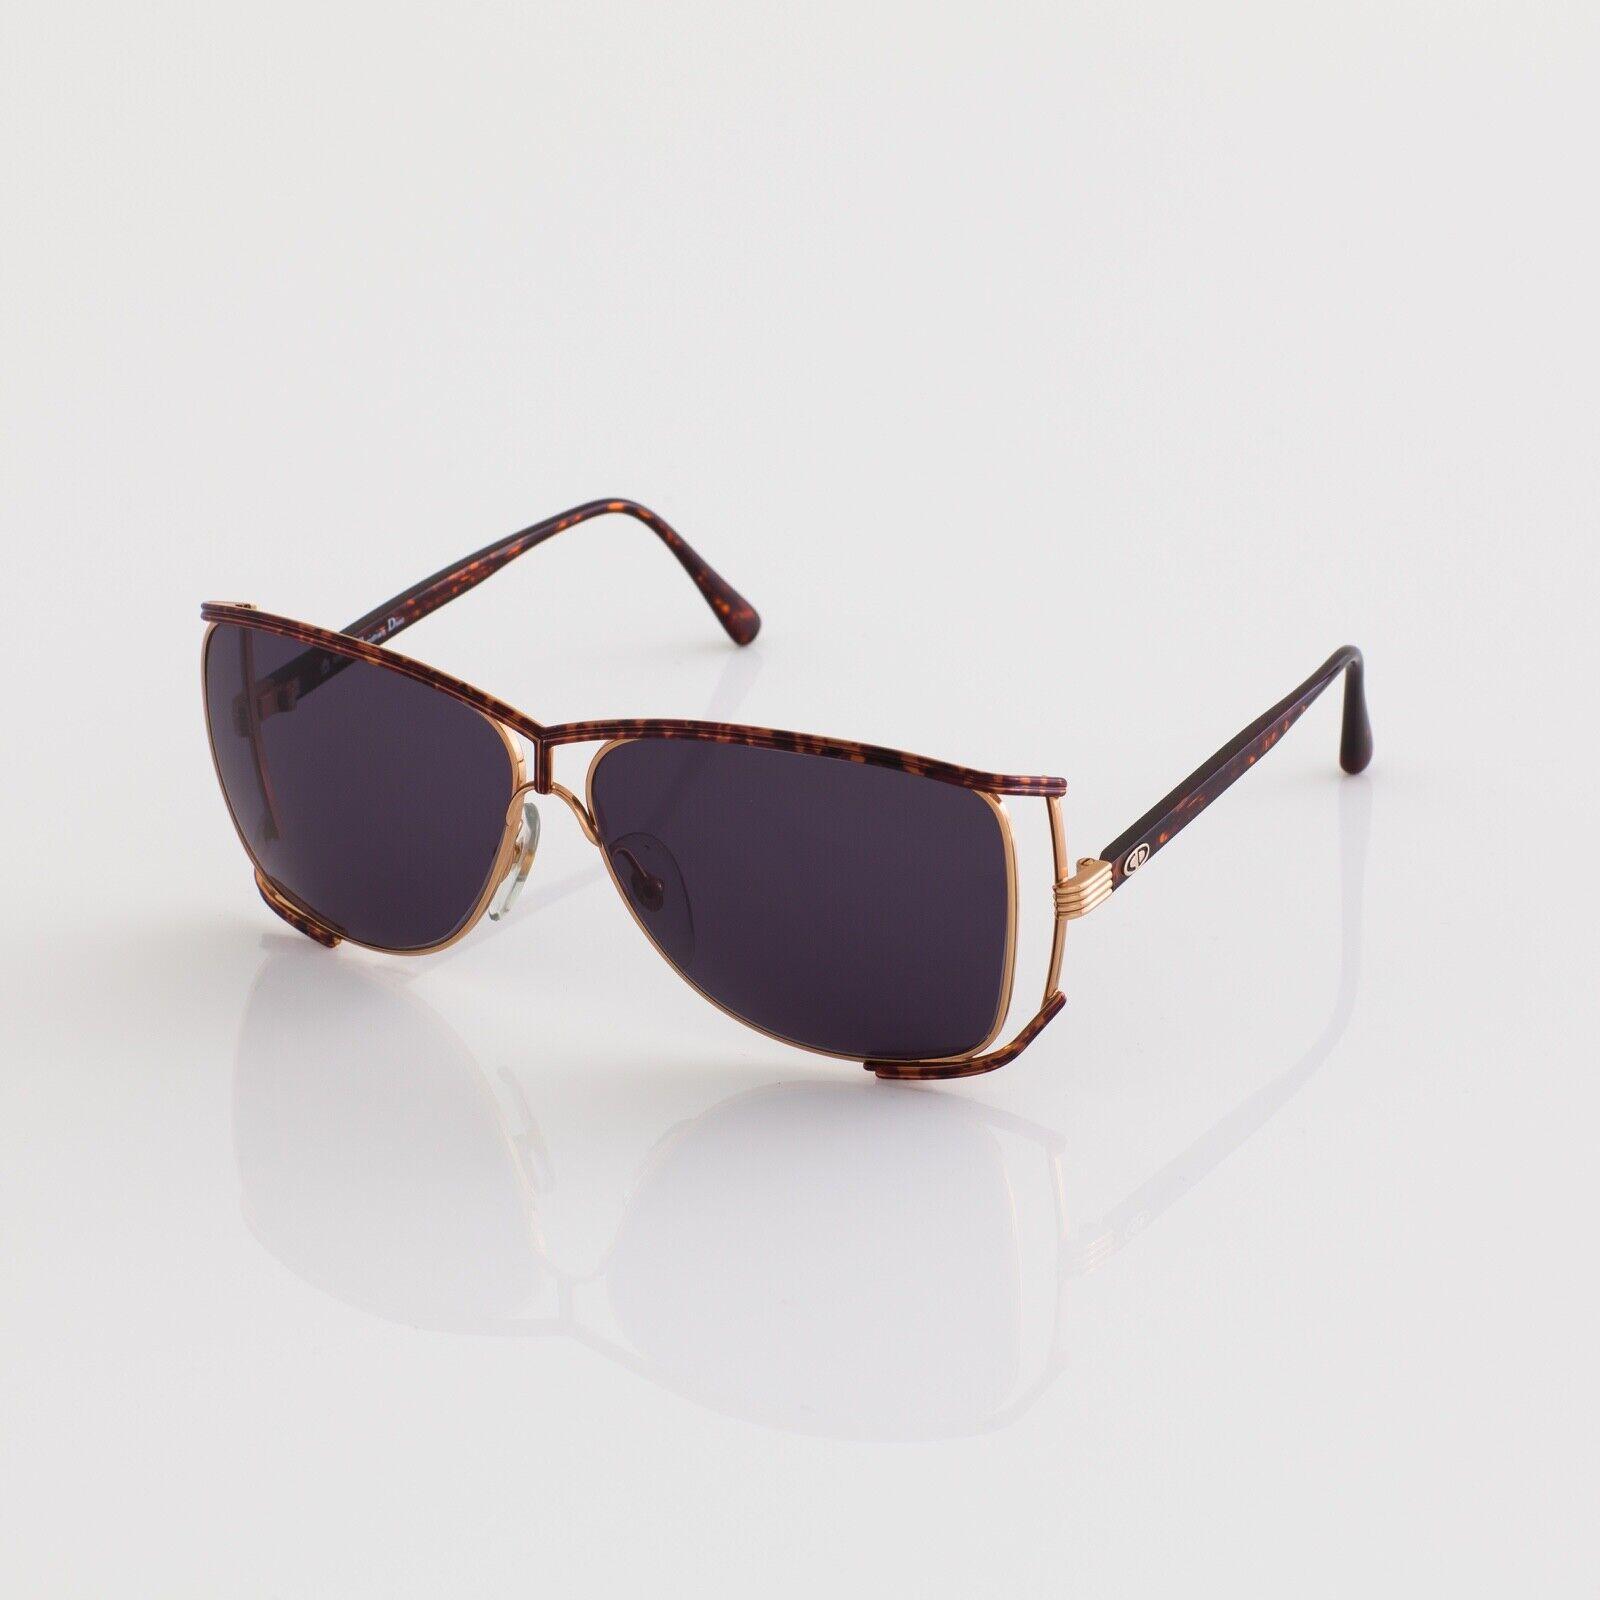 New Vintage Christian Dior CD 2688 Sunglasses C. Tortoise & Gold 63-12mm Italy